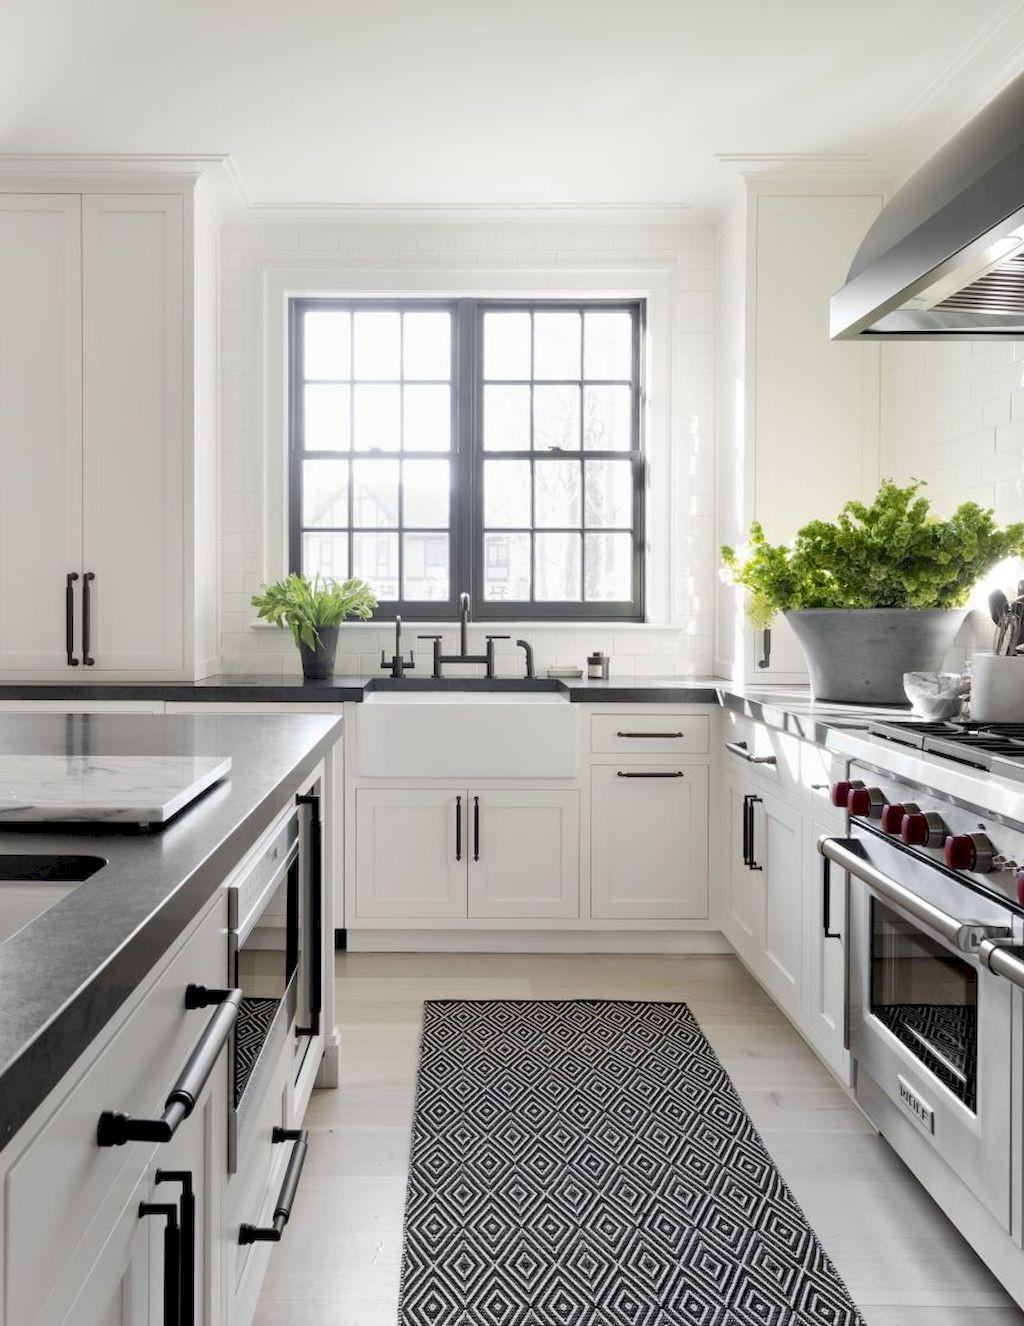 90 Elegant White Kitchen Cabinet Design Ideas